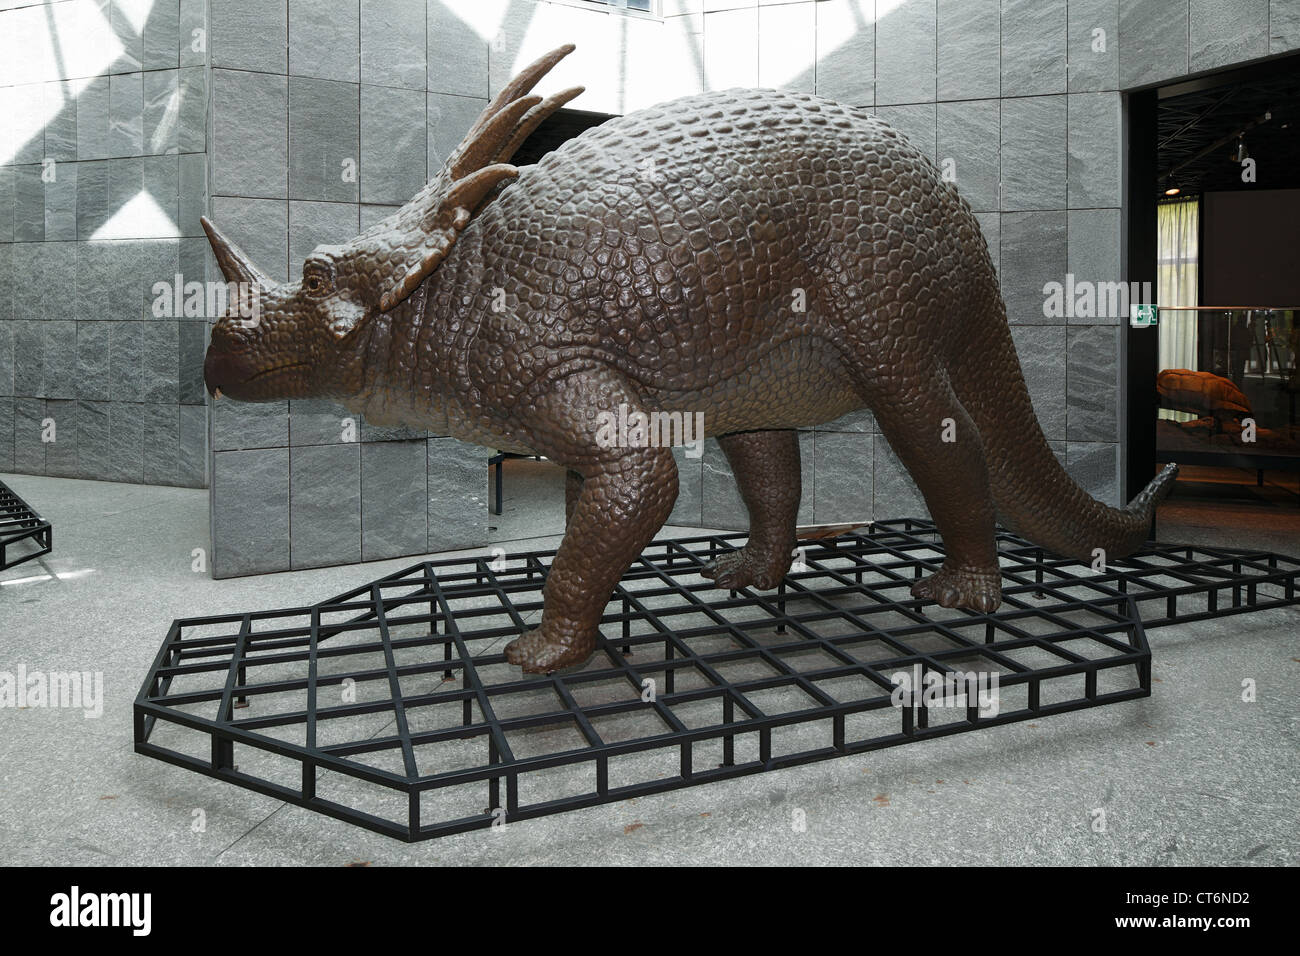 D-Dortmund, Ruhr area, Westphalia, North Rhine-Westphalia, NRW, museum of natural history, reconstruction of Dinosaurs, - Stock Image